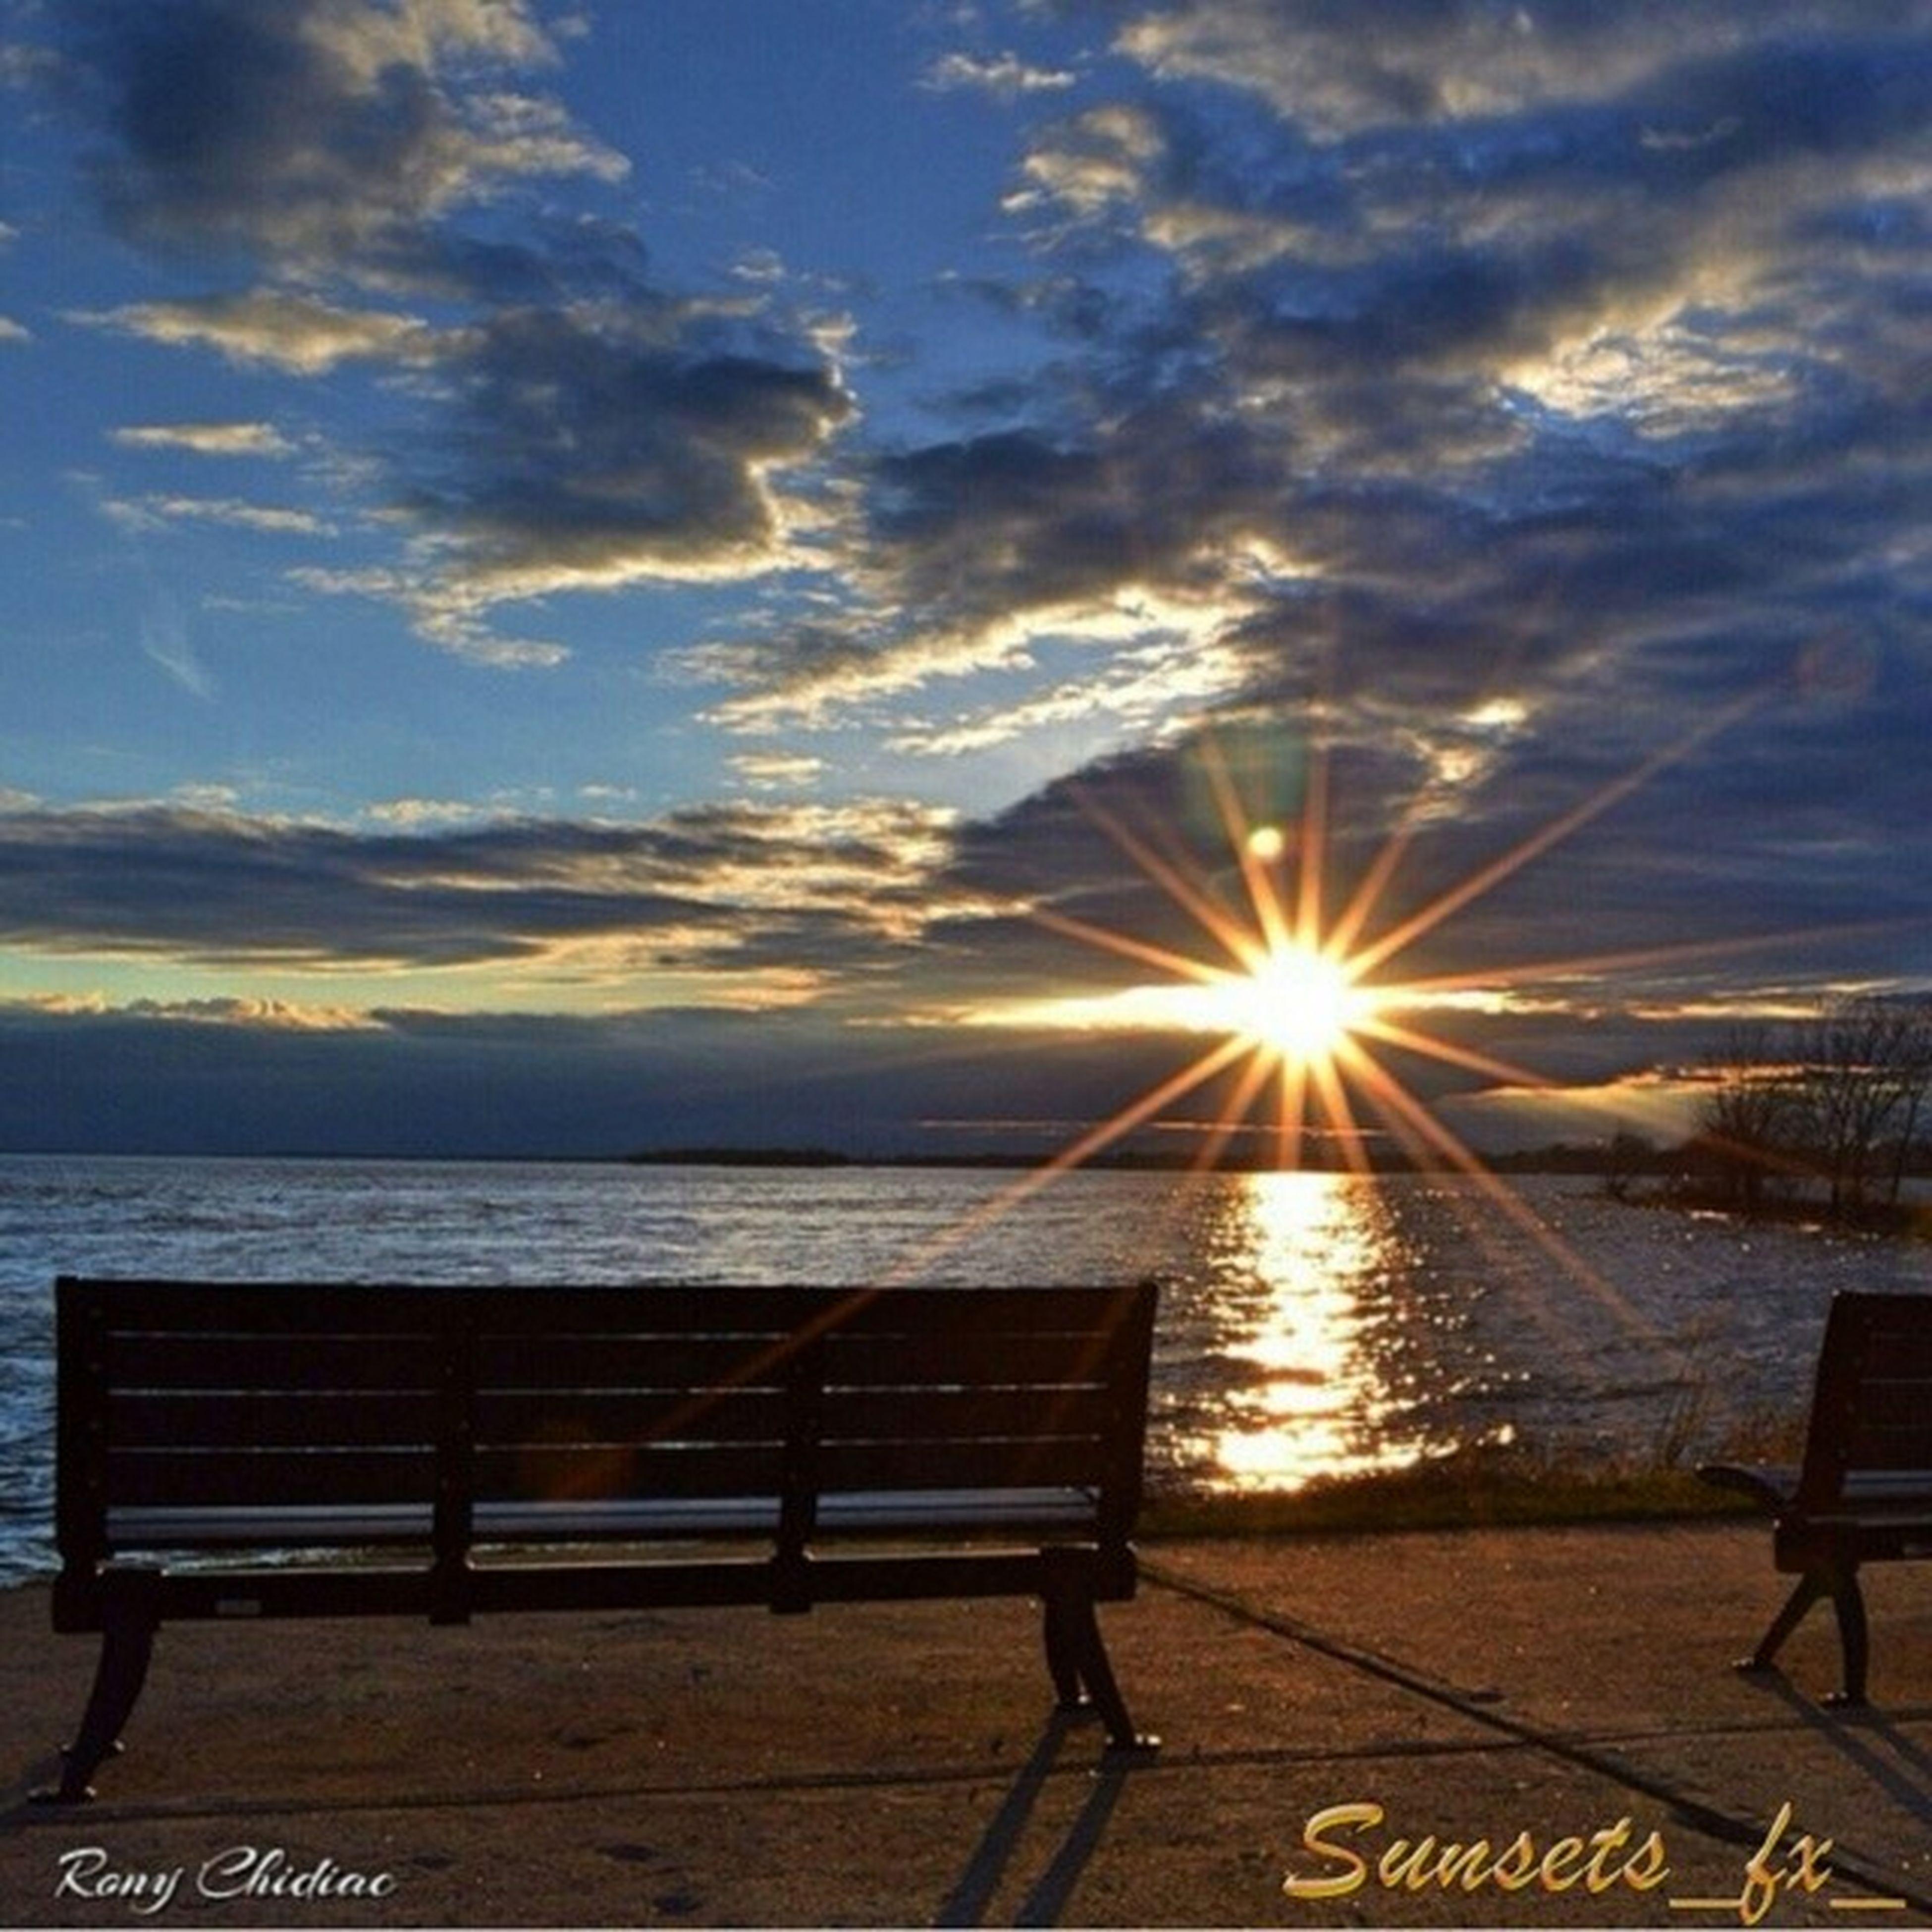 sky, sun, cloud - sky, sunset, sea, sunbeam, sunlight, water, scenics, cloud, beauty in nature, cloudy, tranquil scene, tranquility, nature, horizon over water, lens flare, beach, idyllic, outdoors